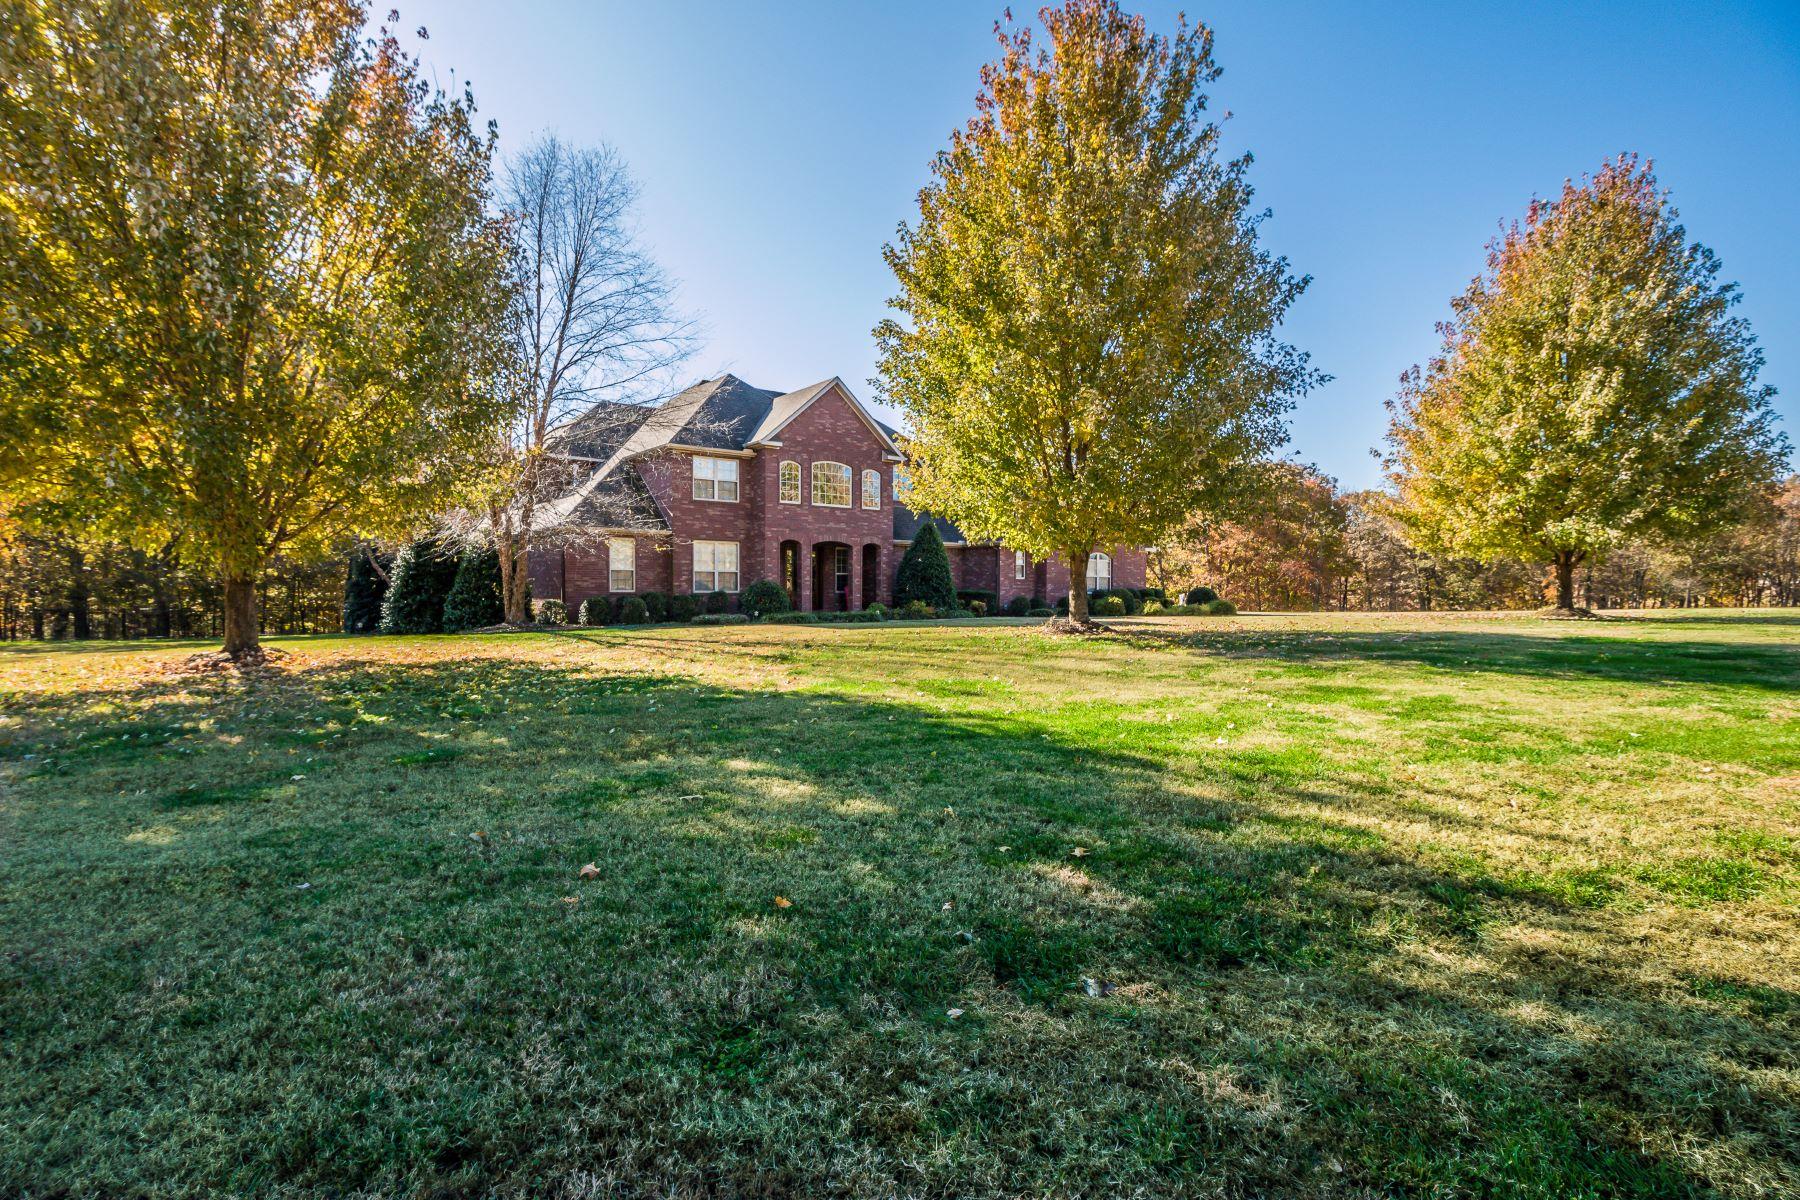 Single Family Homes for Sale at 12662 Miller Church Road Bentonville, Arkansas 72712 United States